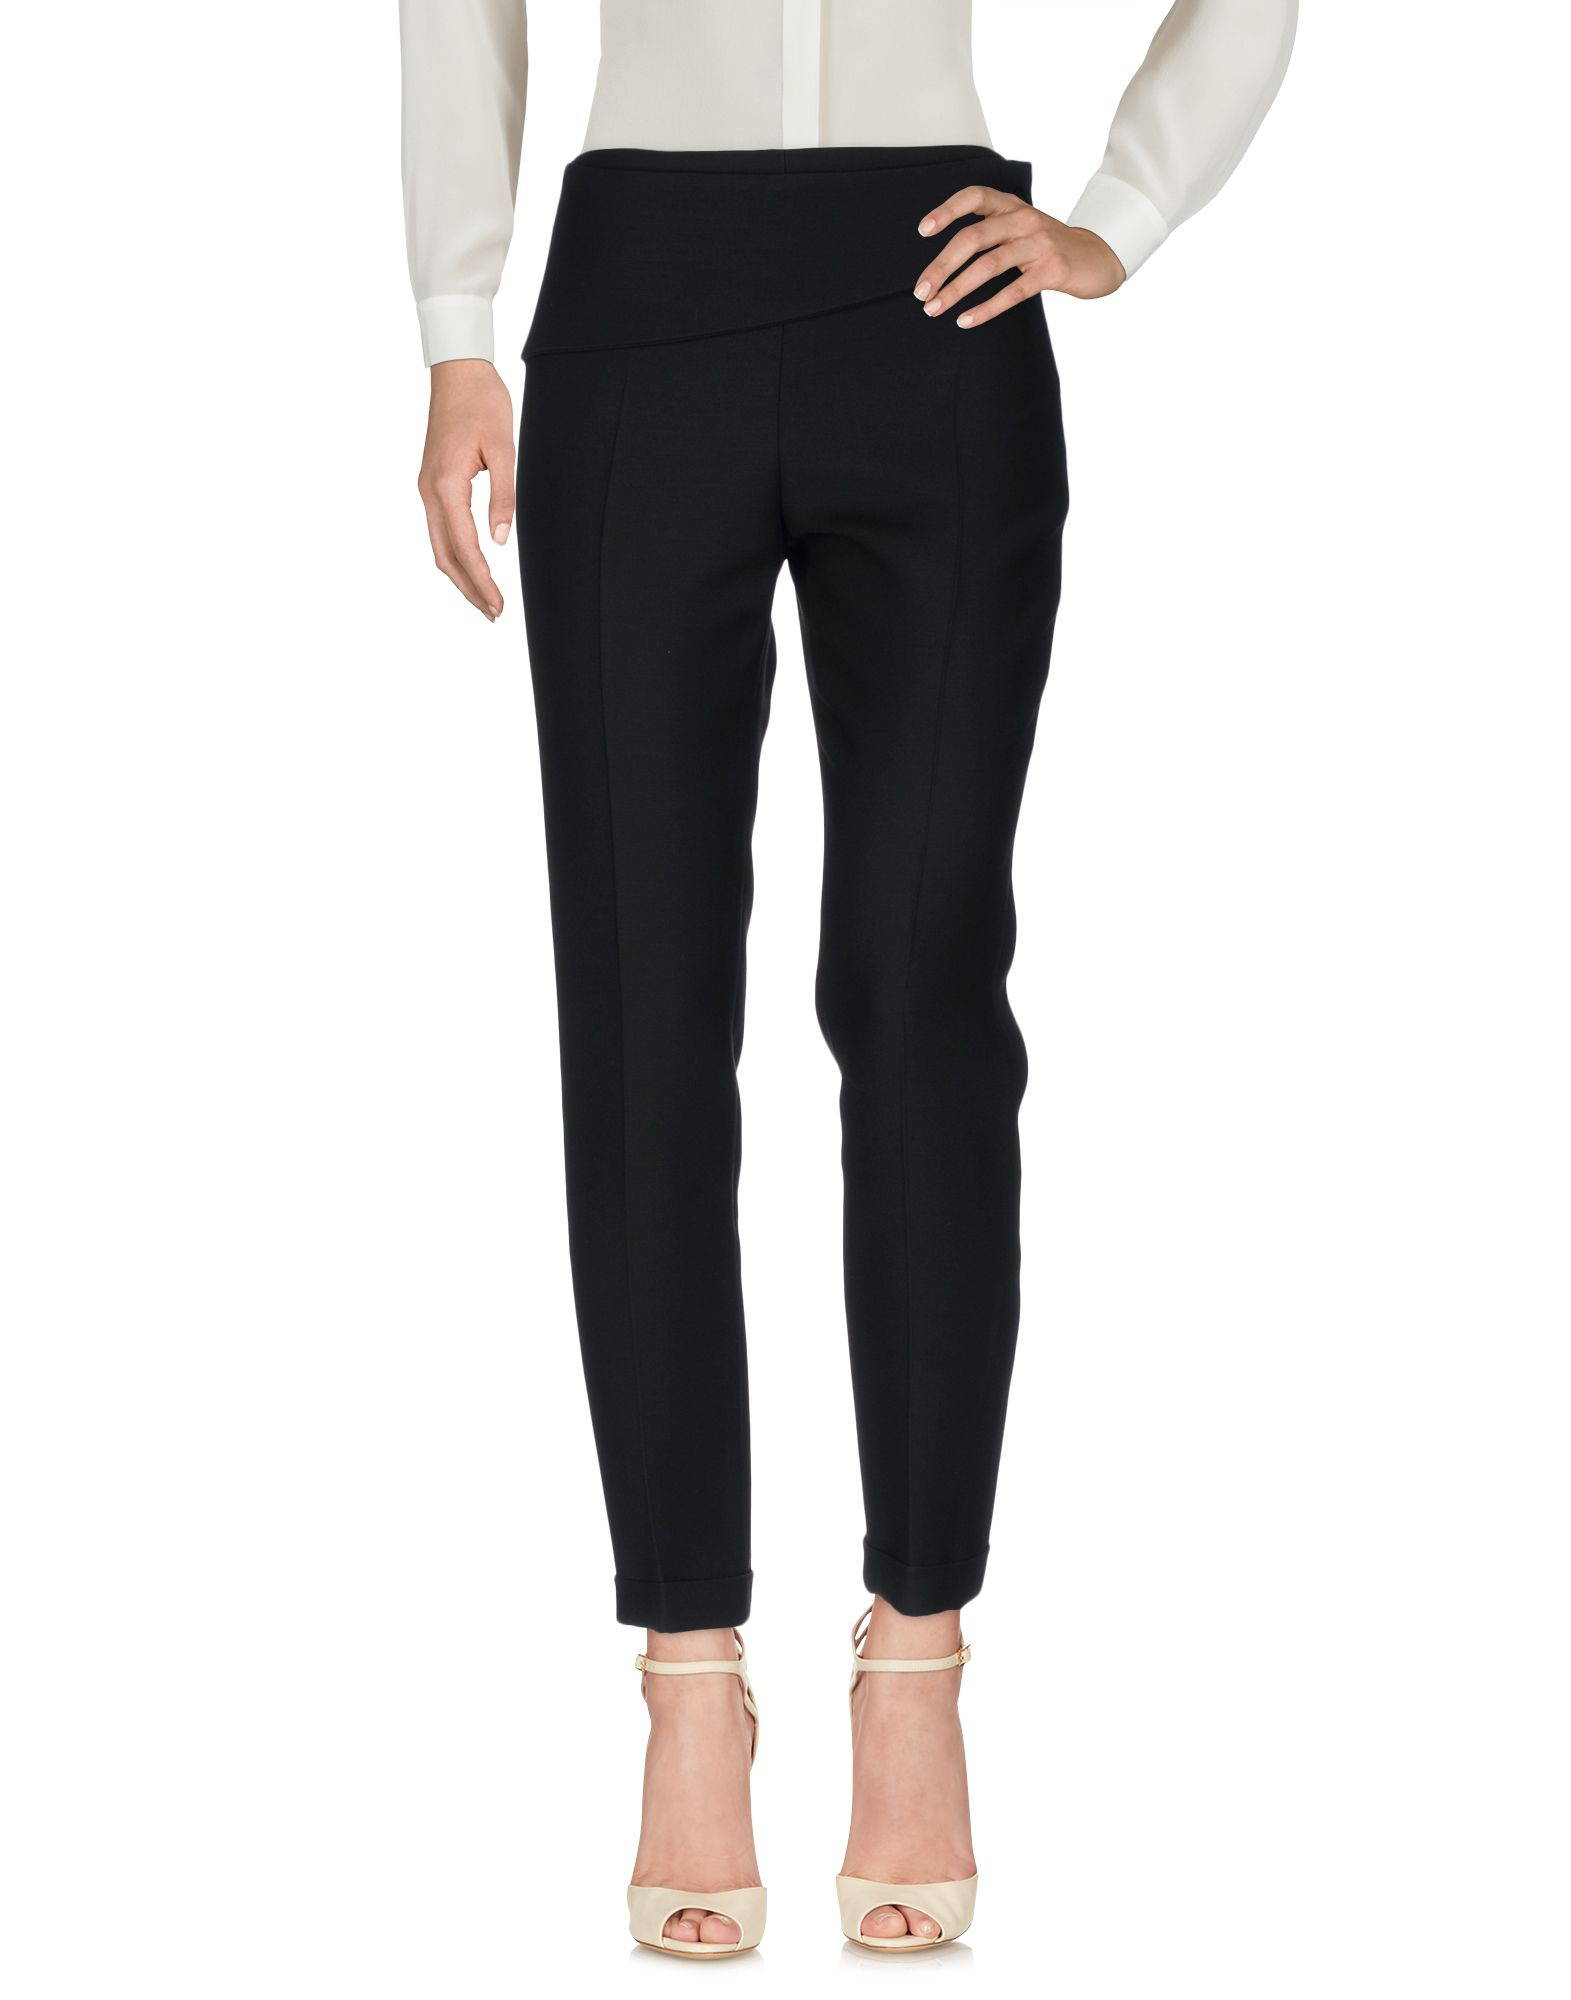 Pantalone Dior Donna - Acquista online su 00X5A9oaG